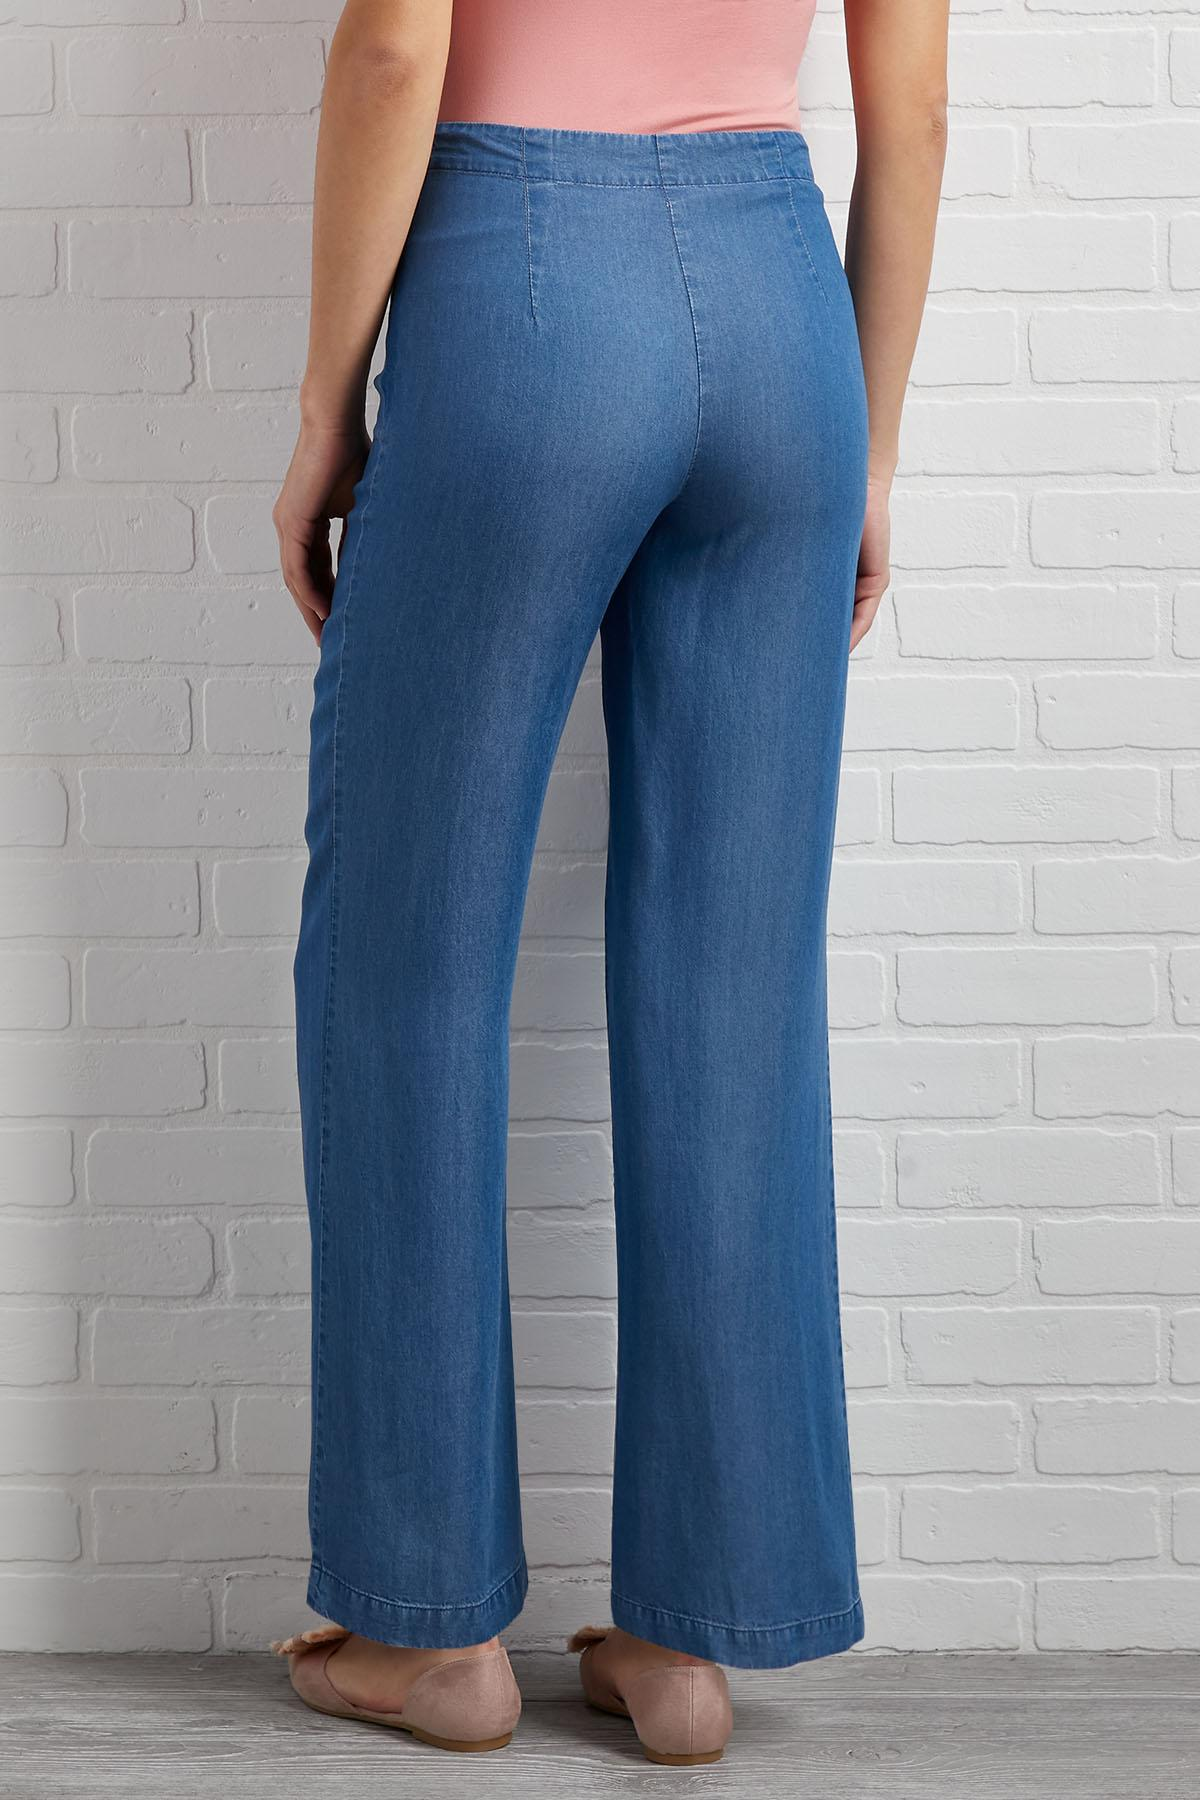 Denim Days Pants